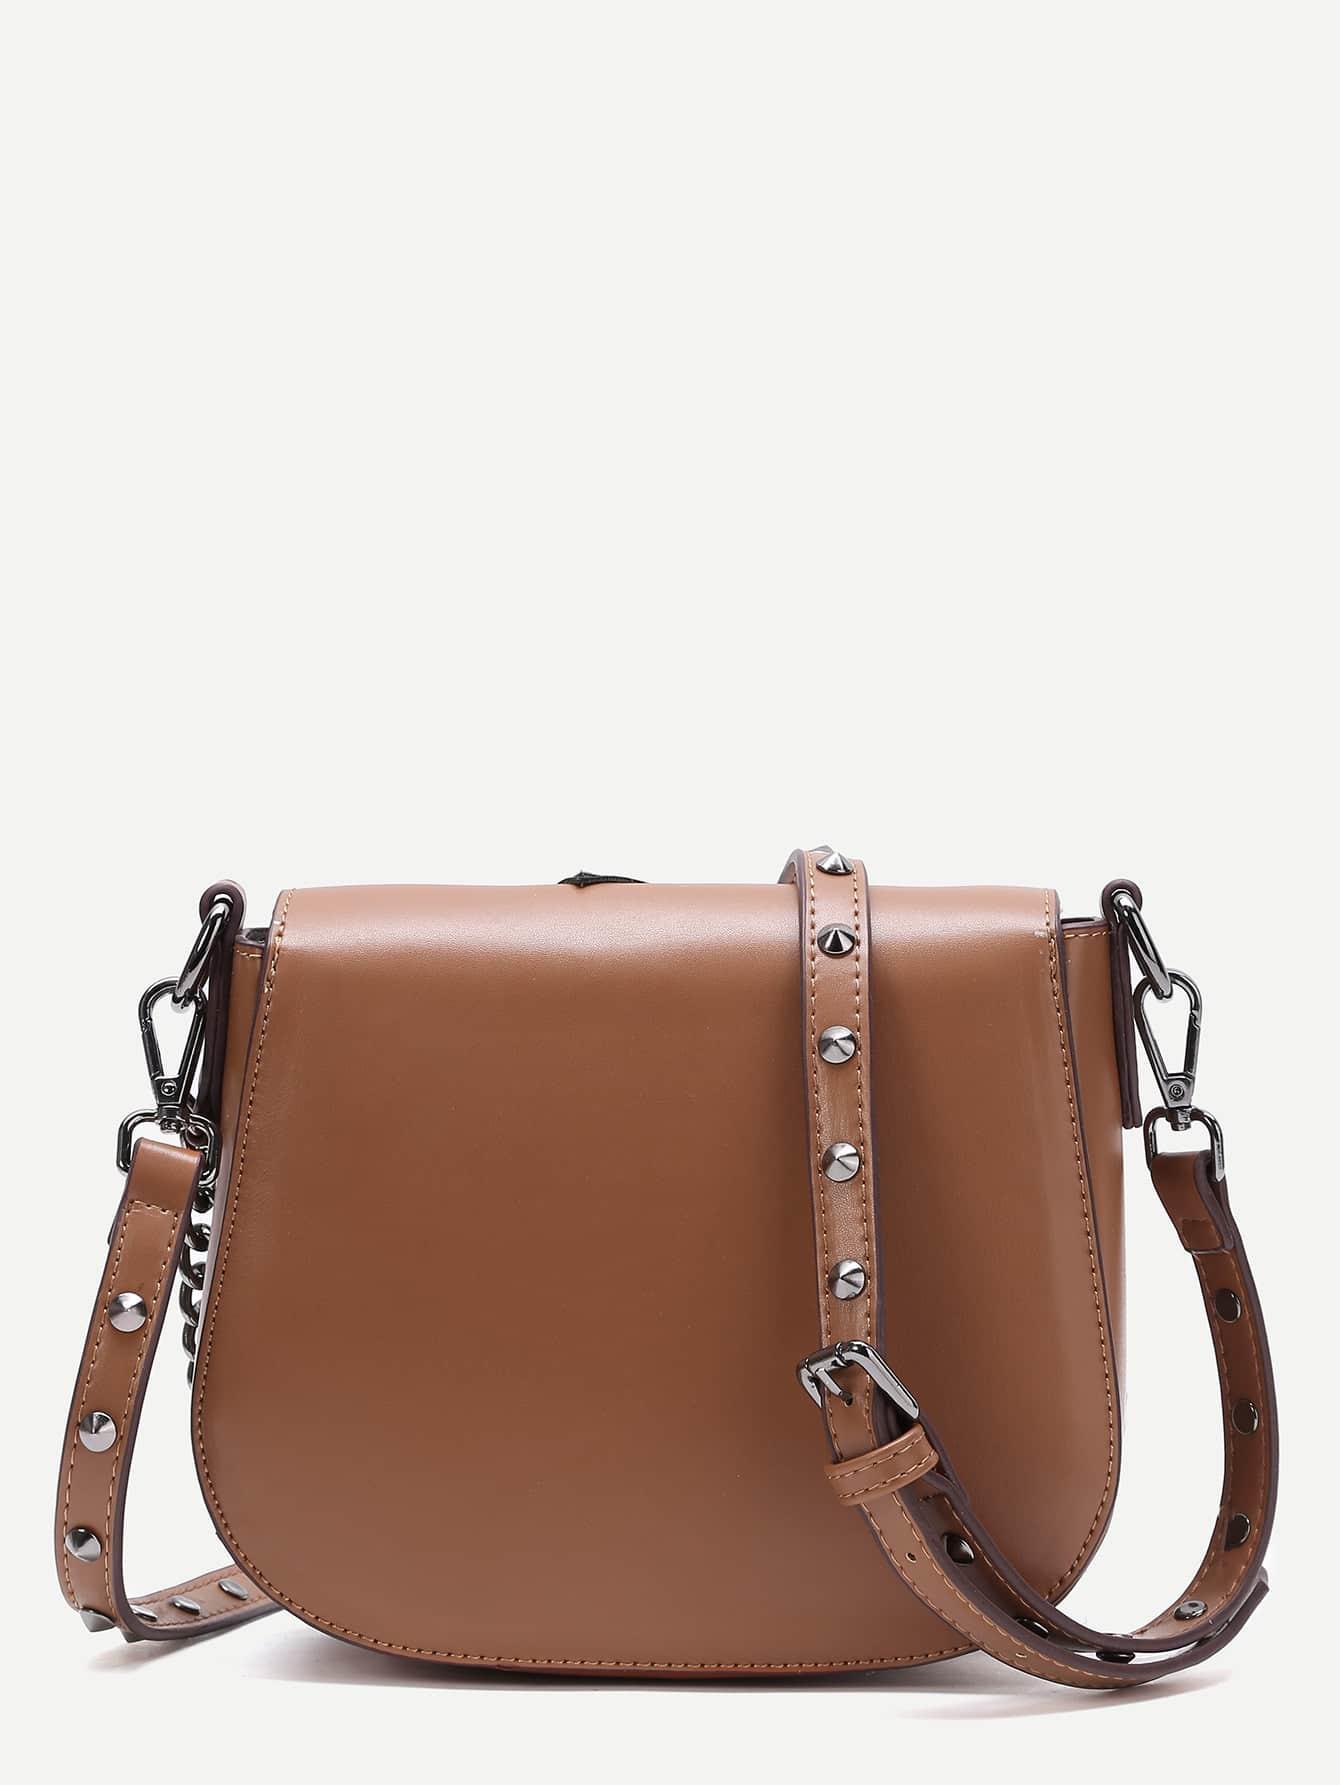 bag161229901_2